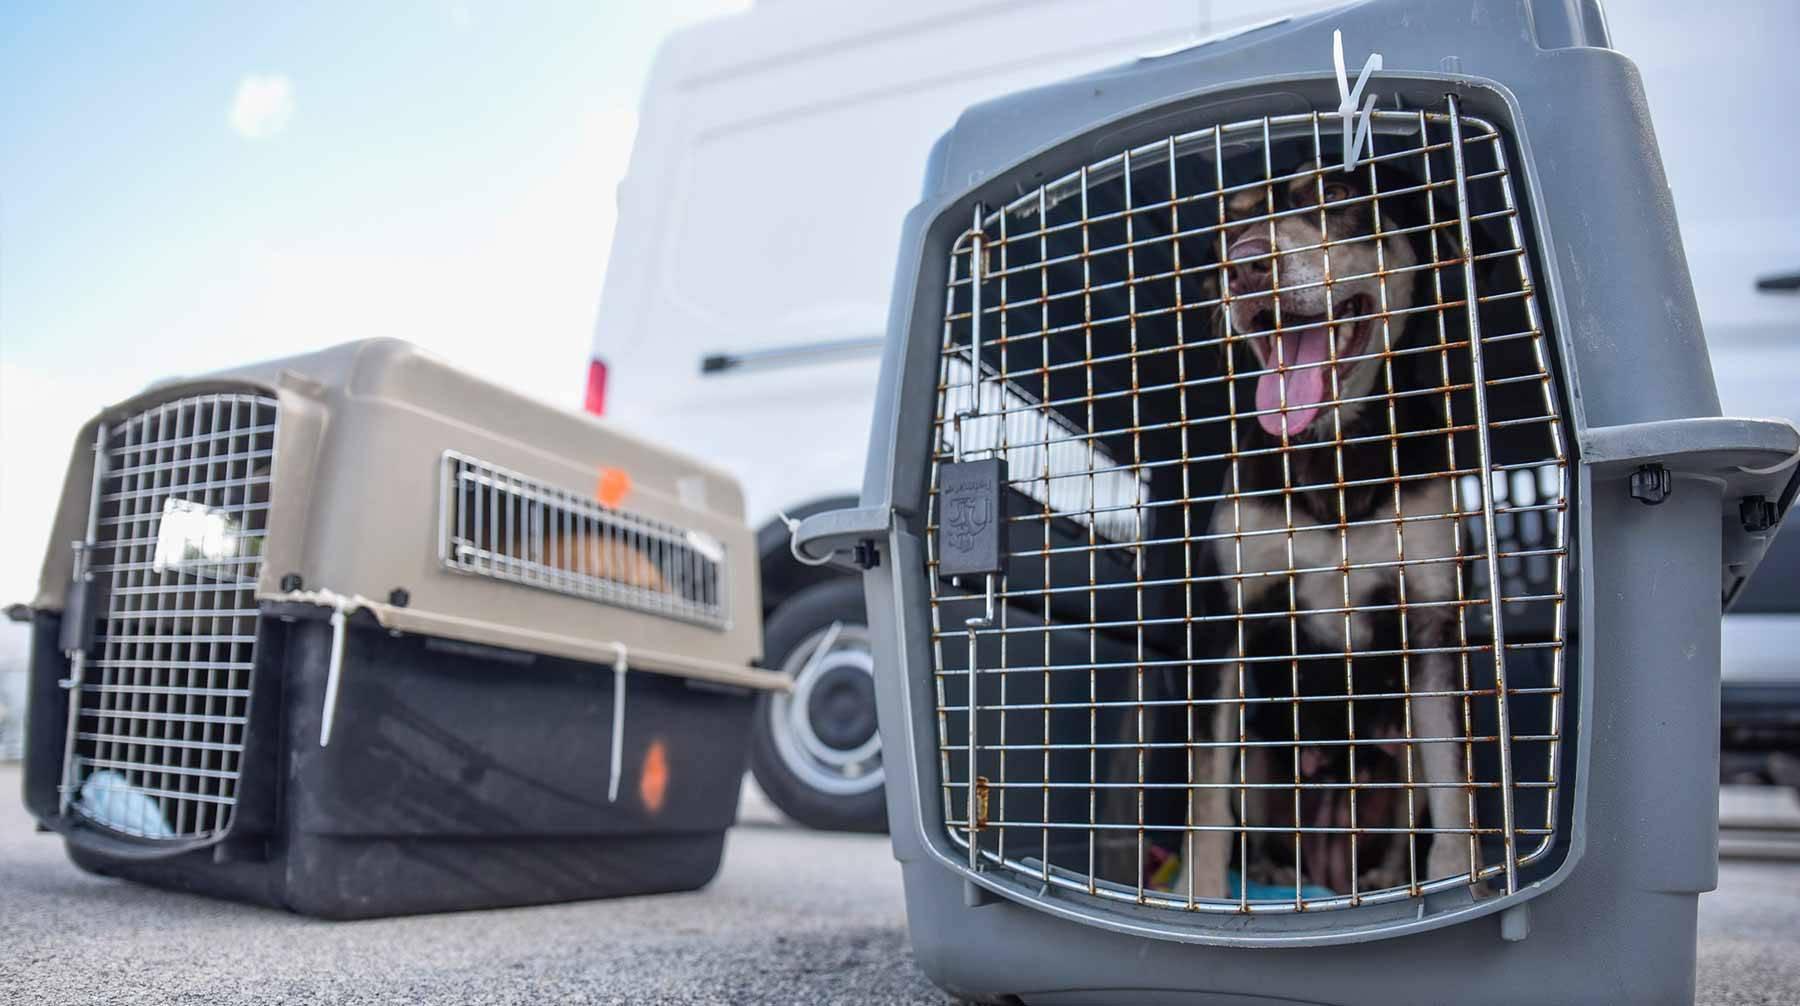 Перевозка собак в самолете по россии, туристу на заметку